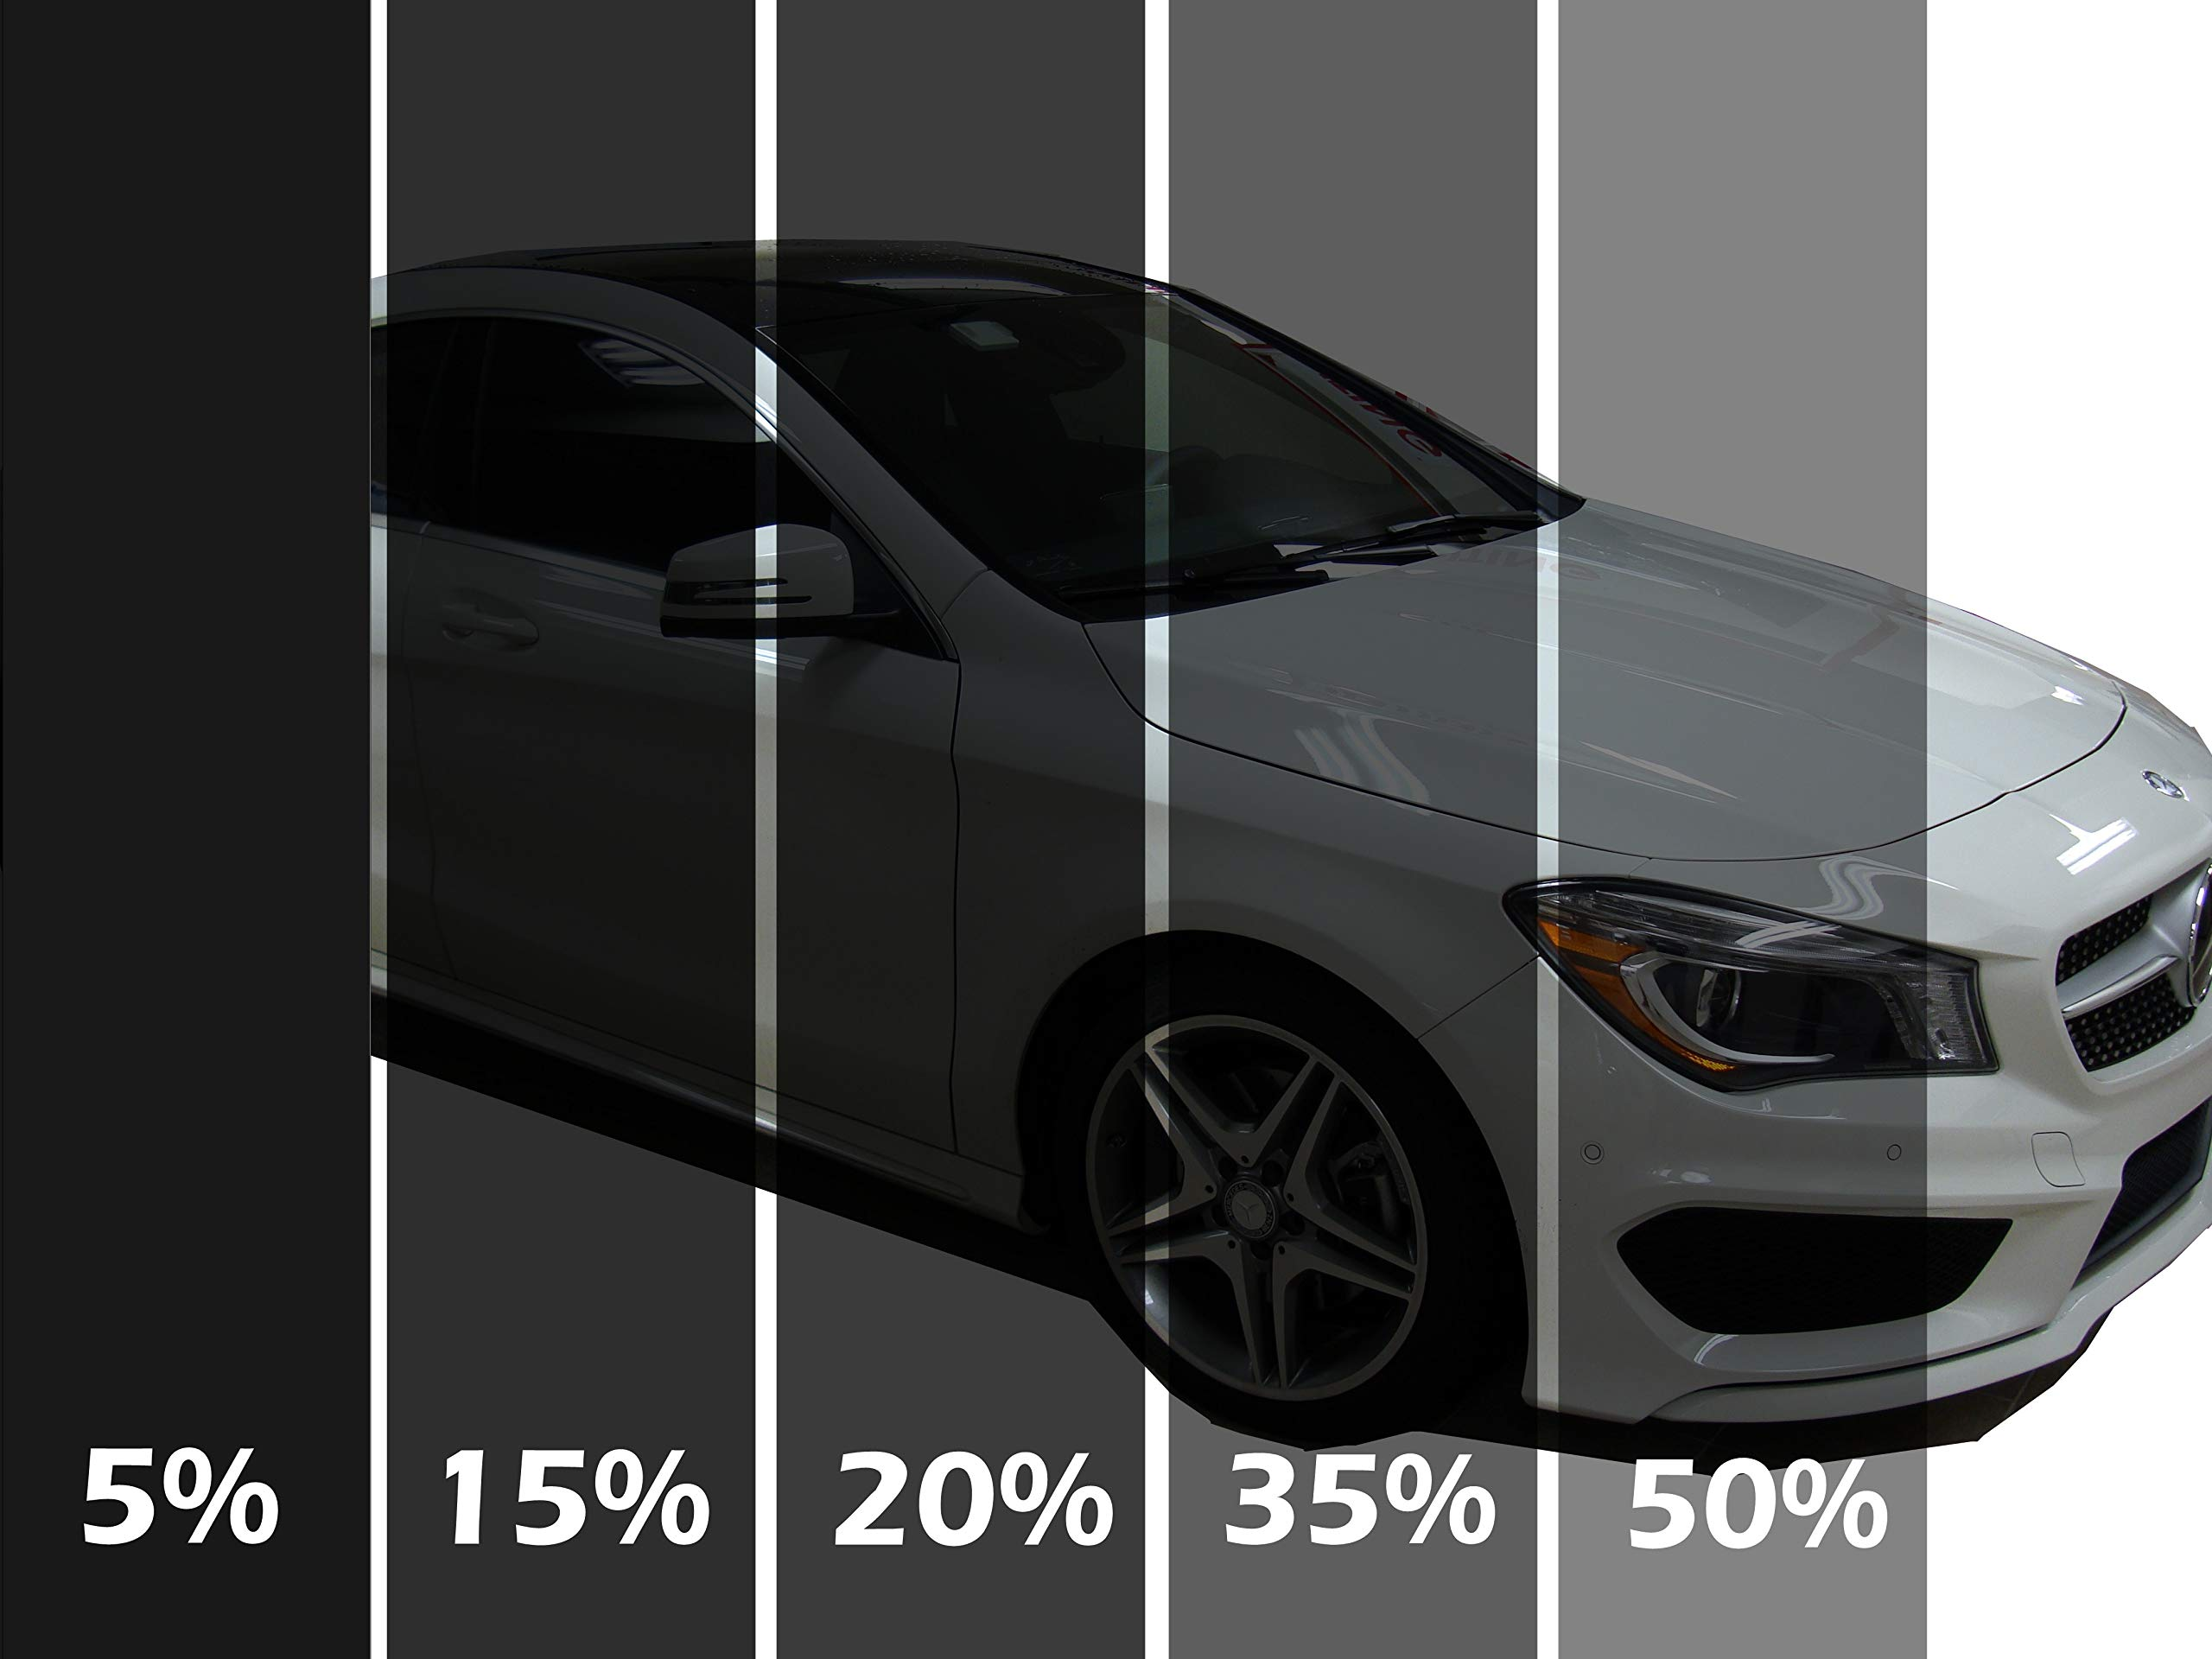 LEXEN 2Ply Premium Carbon 20'' X 100FT Roll Window Tint Film Auto Car (5% Limo (Darkest Shade)) by LEXEN (Image #3)